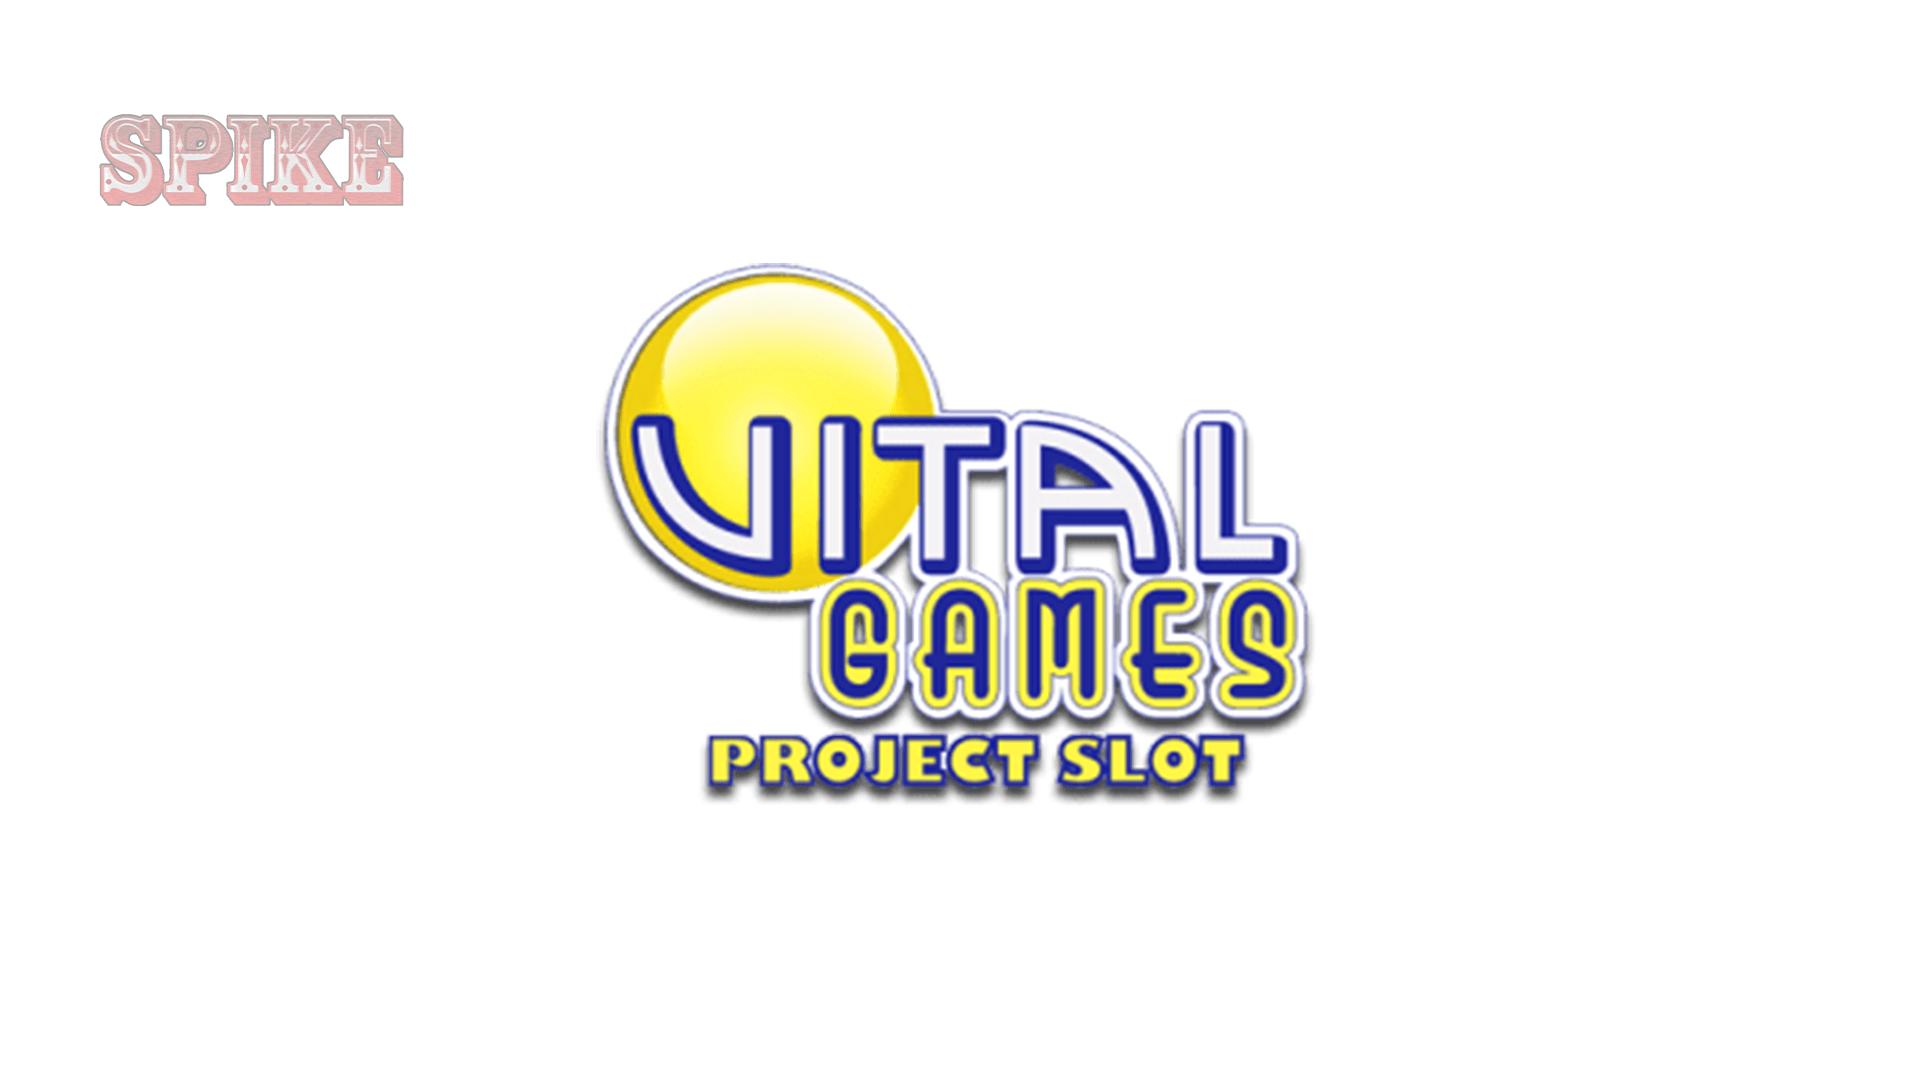 vital games produttore slot bar slot online